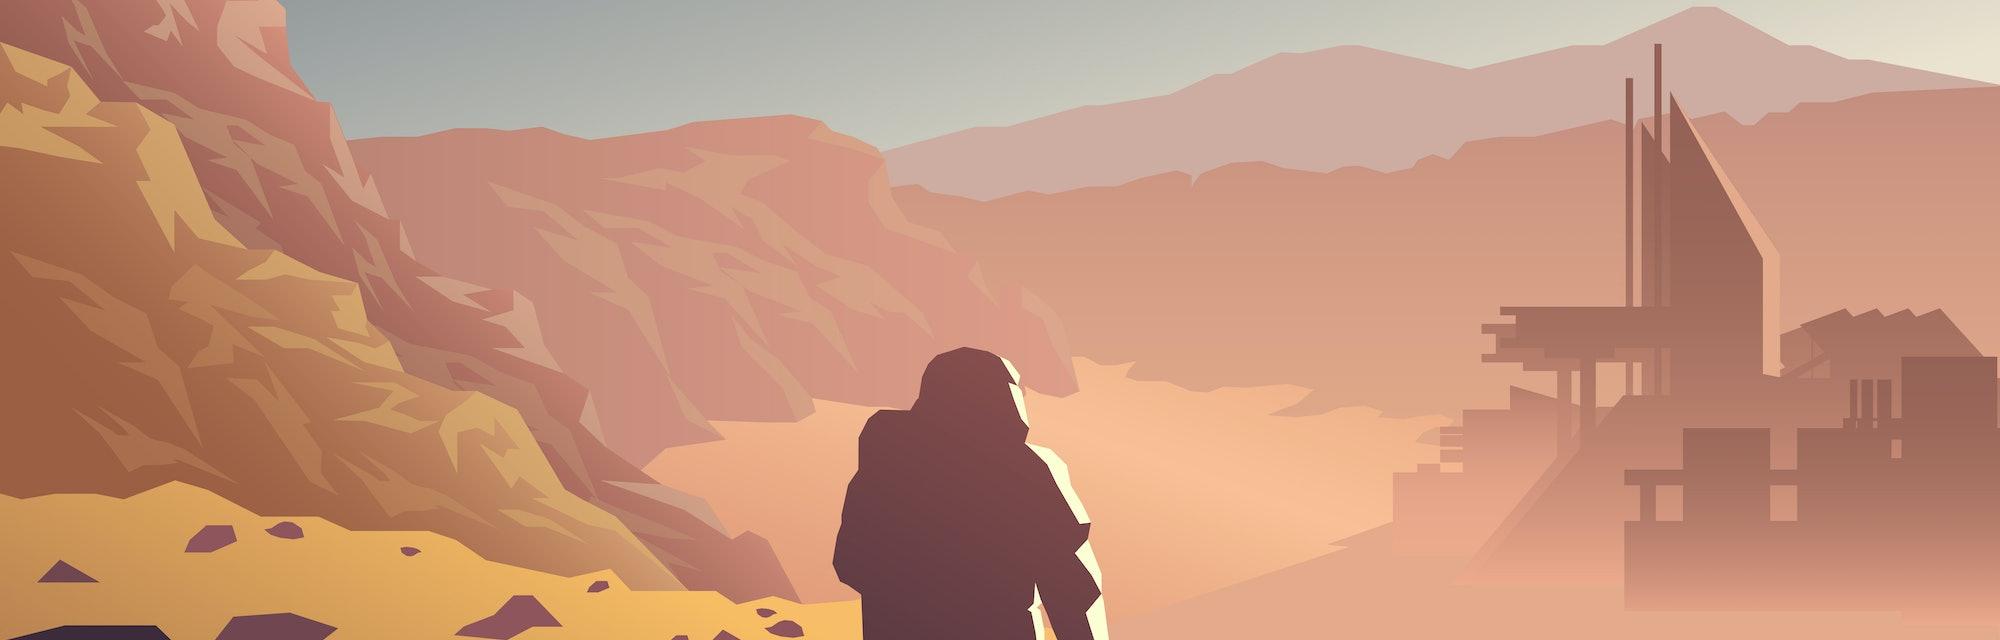 Mars colonization futuristic landscape with colony base and astronaut illustration